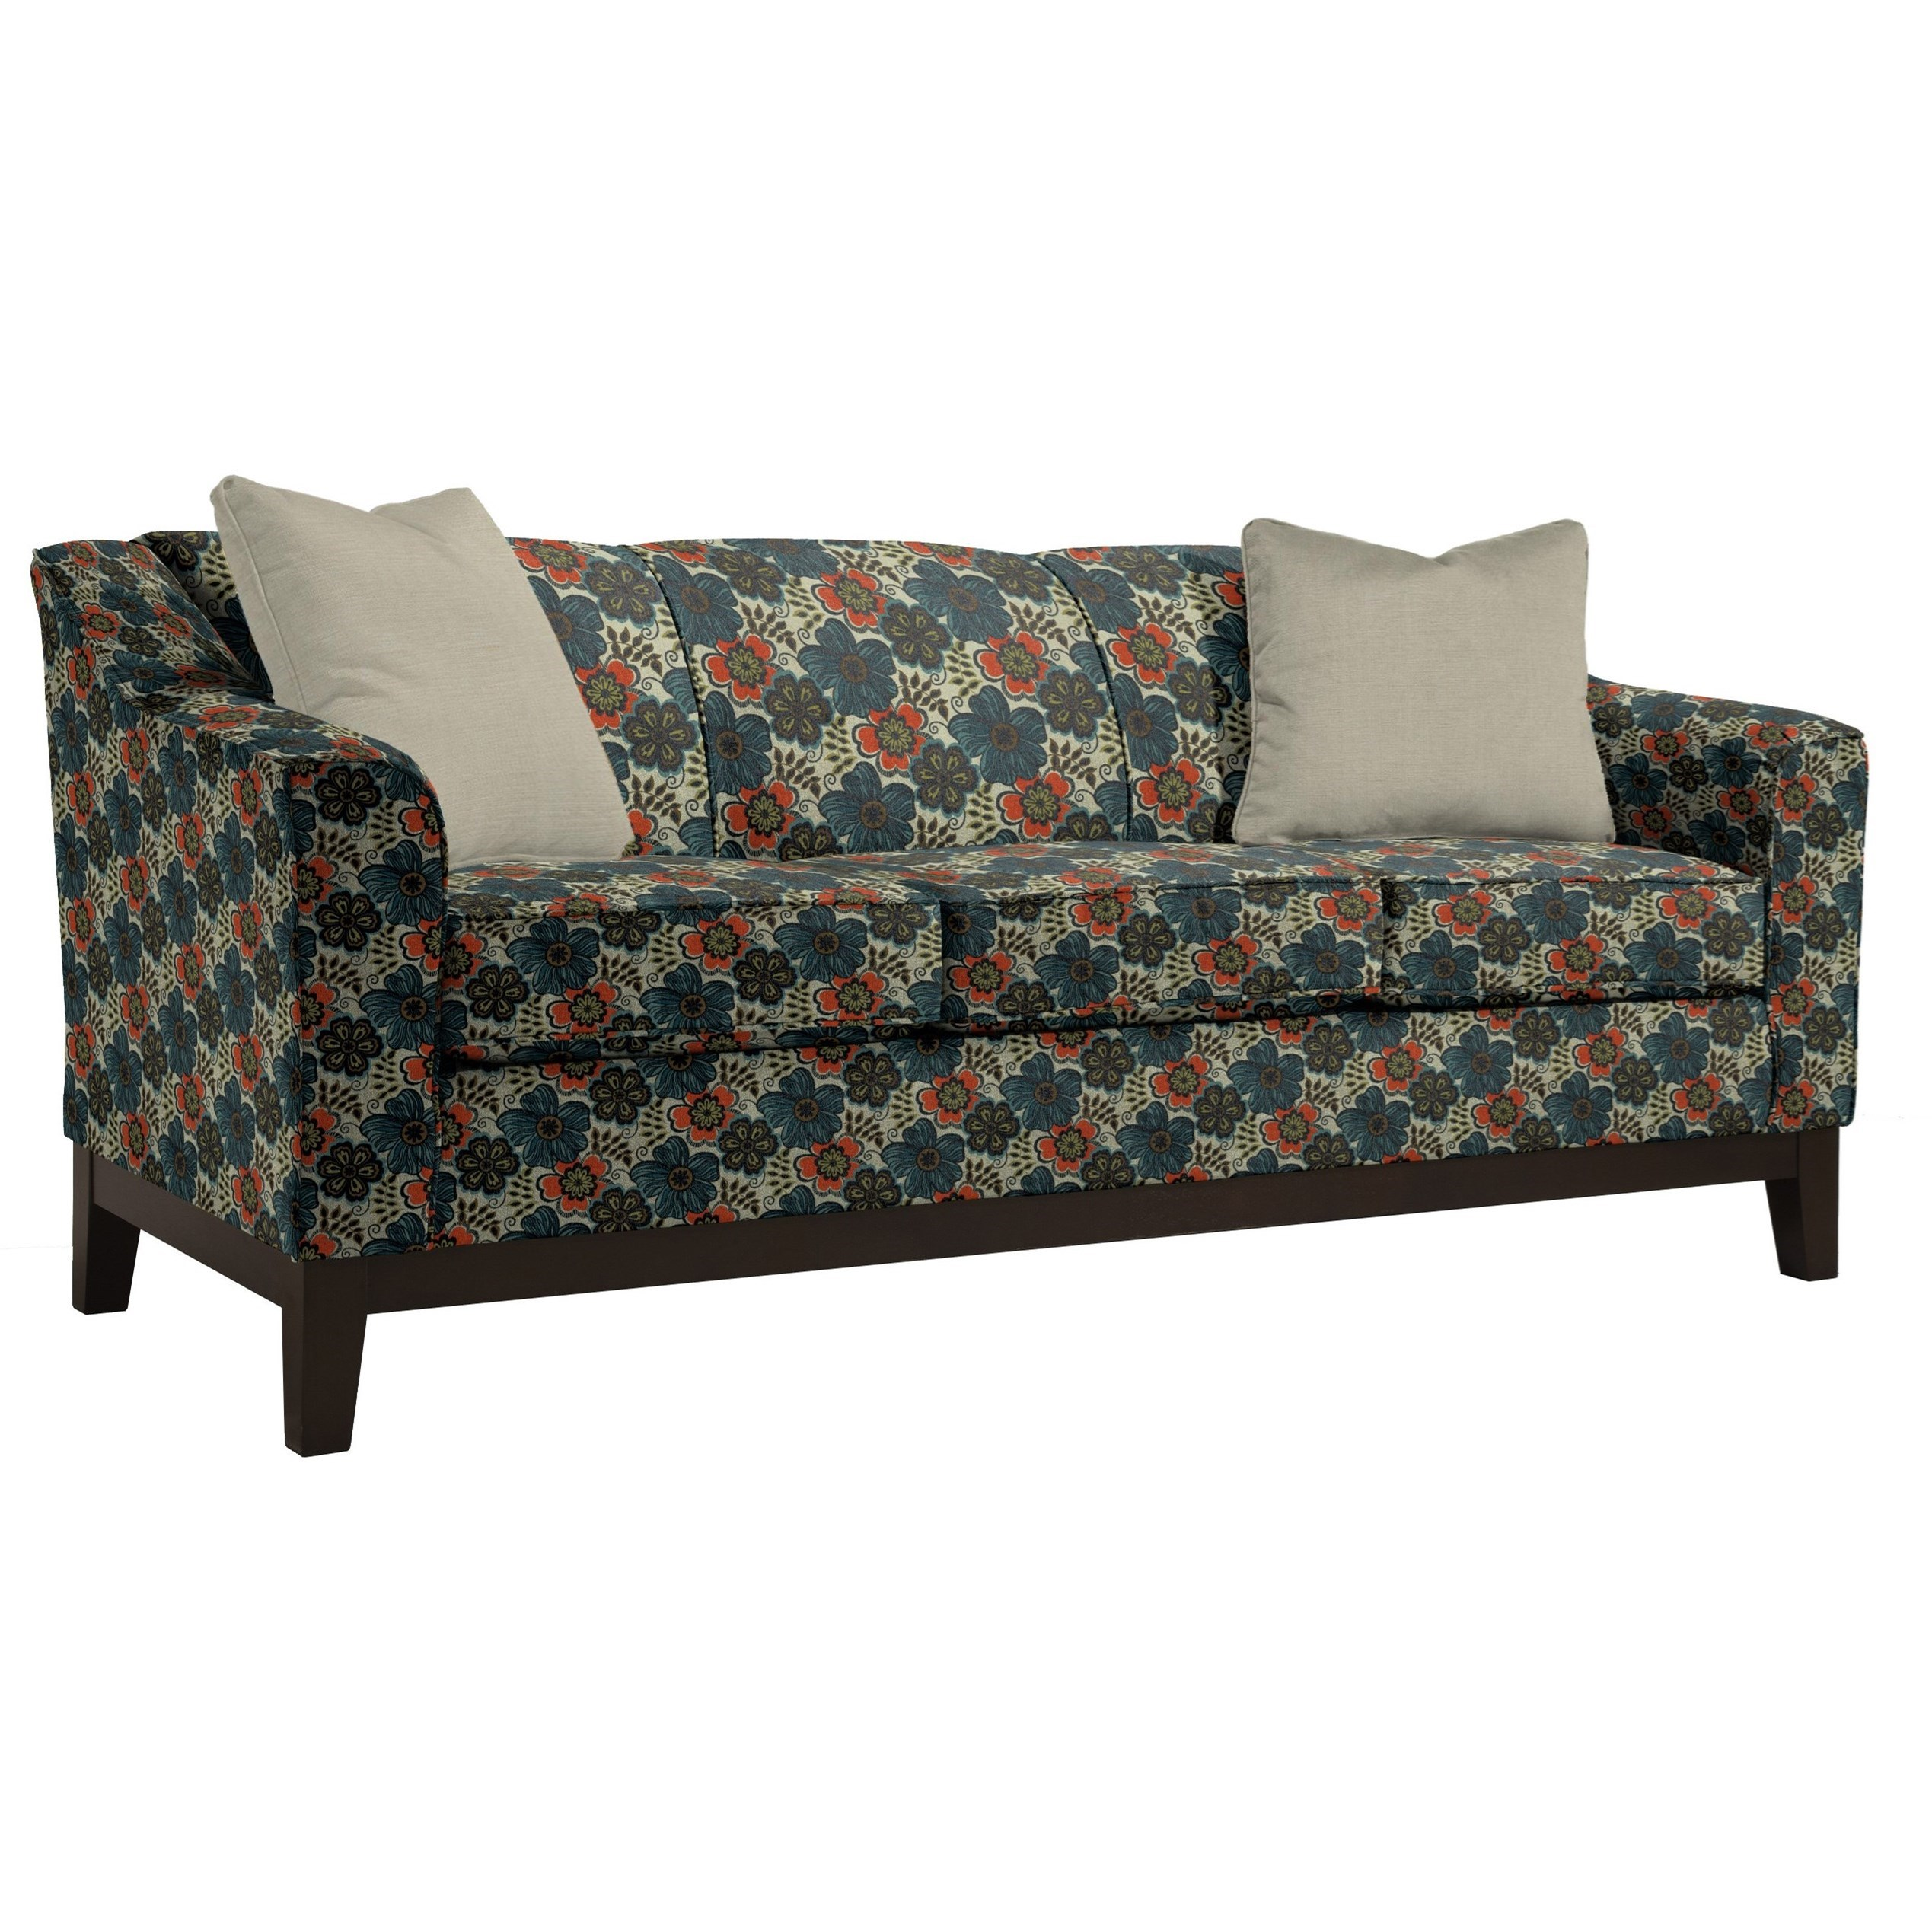 Best Home Furnishings Emeline Customizable Sofa - Item Number: 206338137-33212